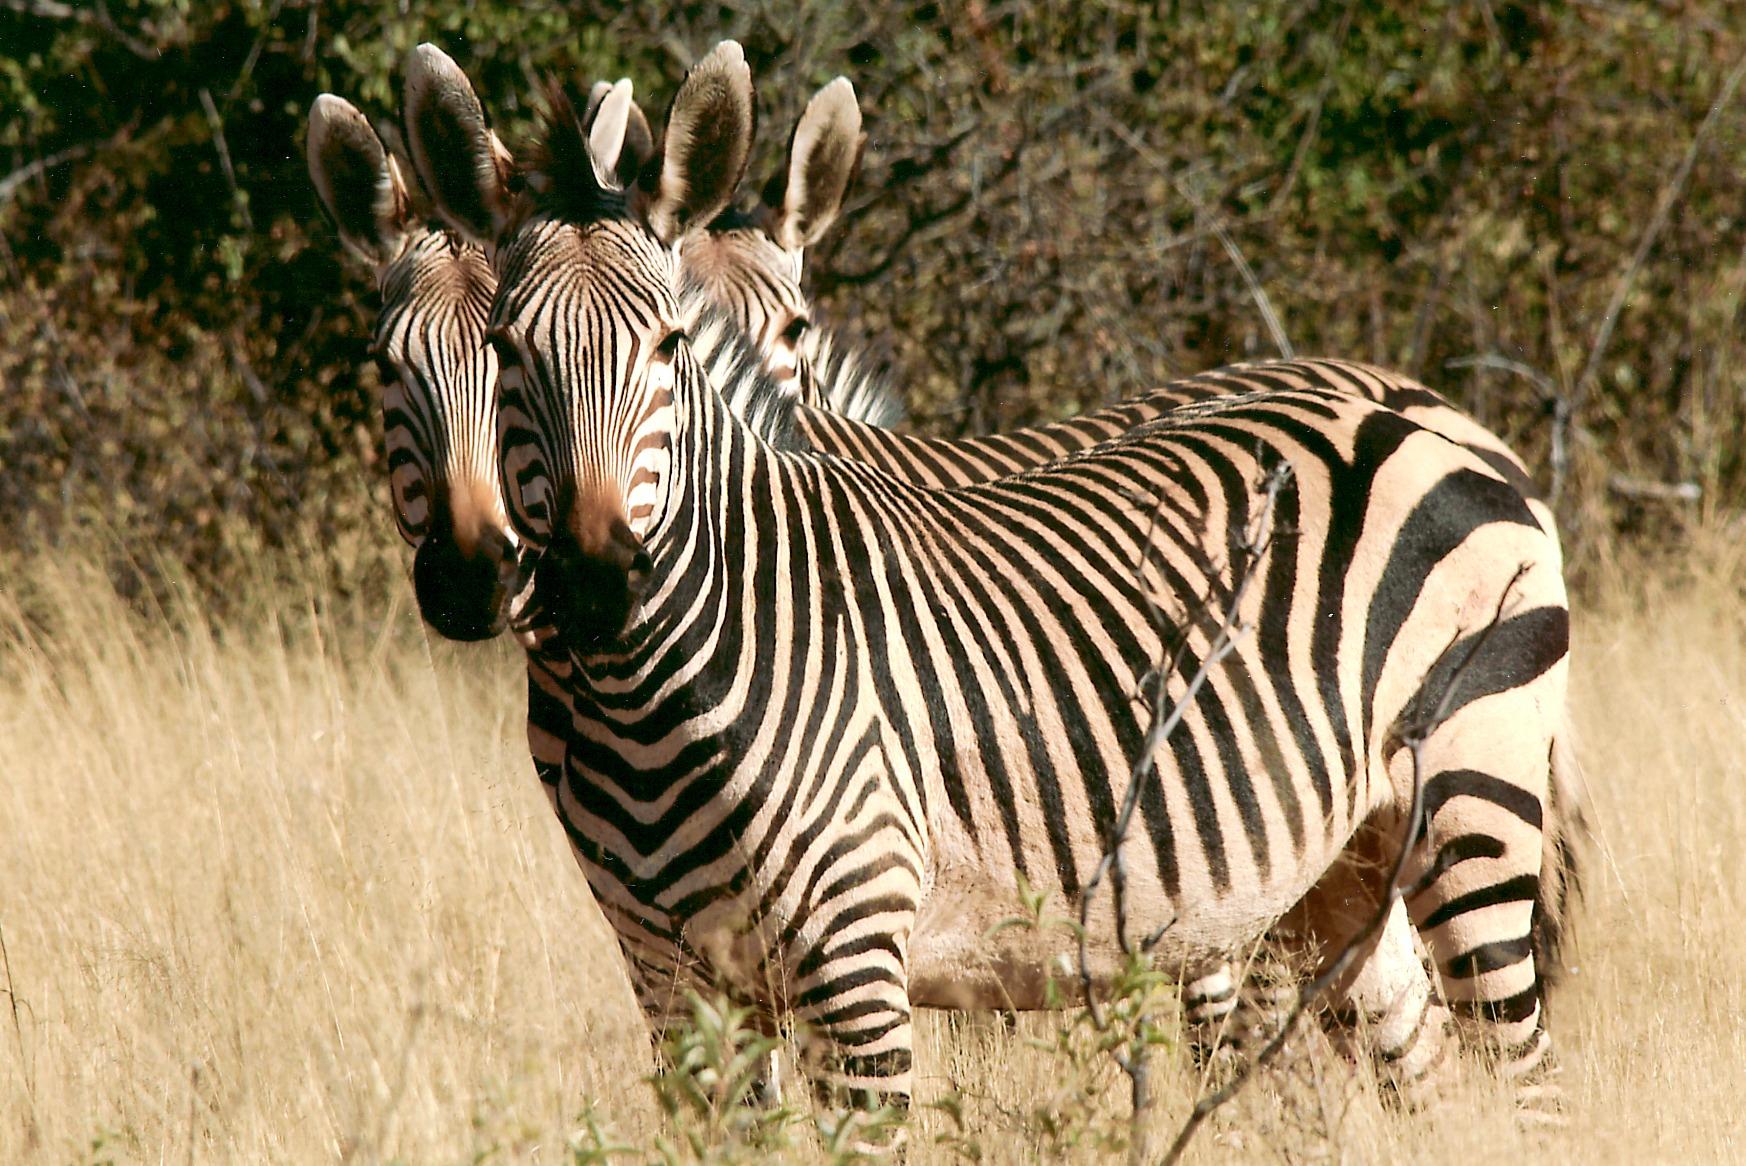 Rare animals list pictures 100 best William Marrion Branham images on Pinterest Message